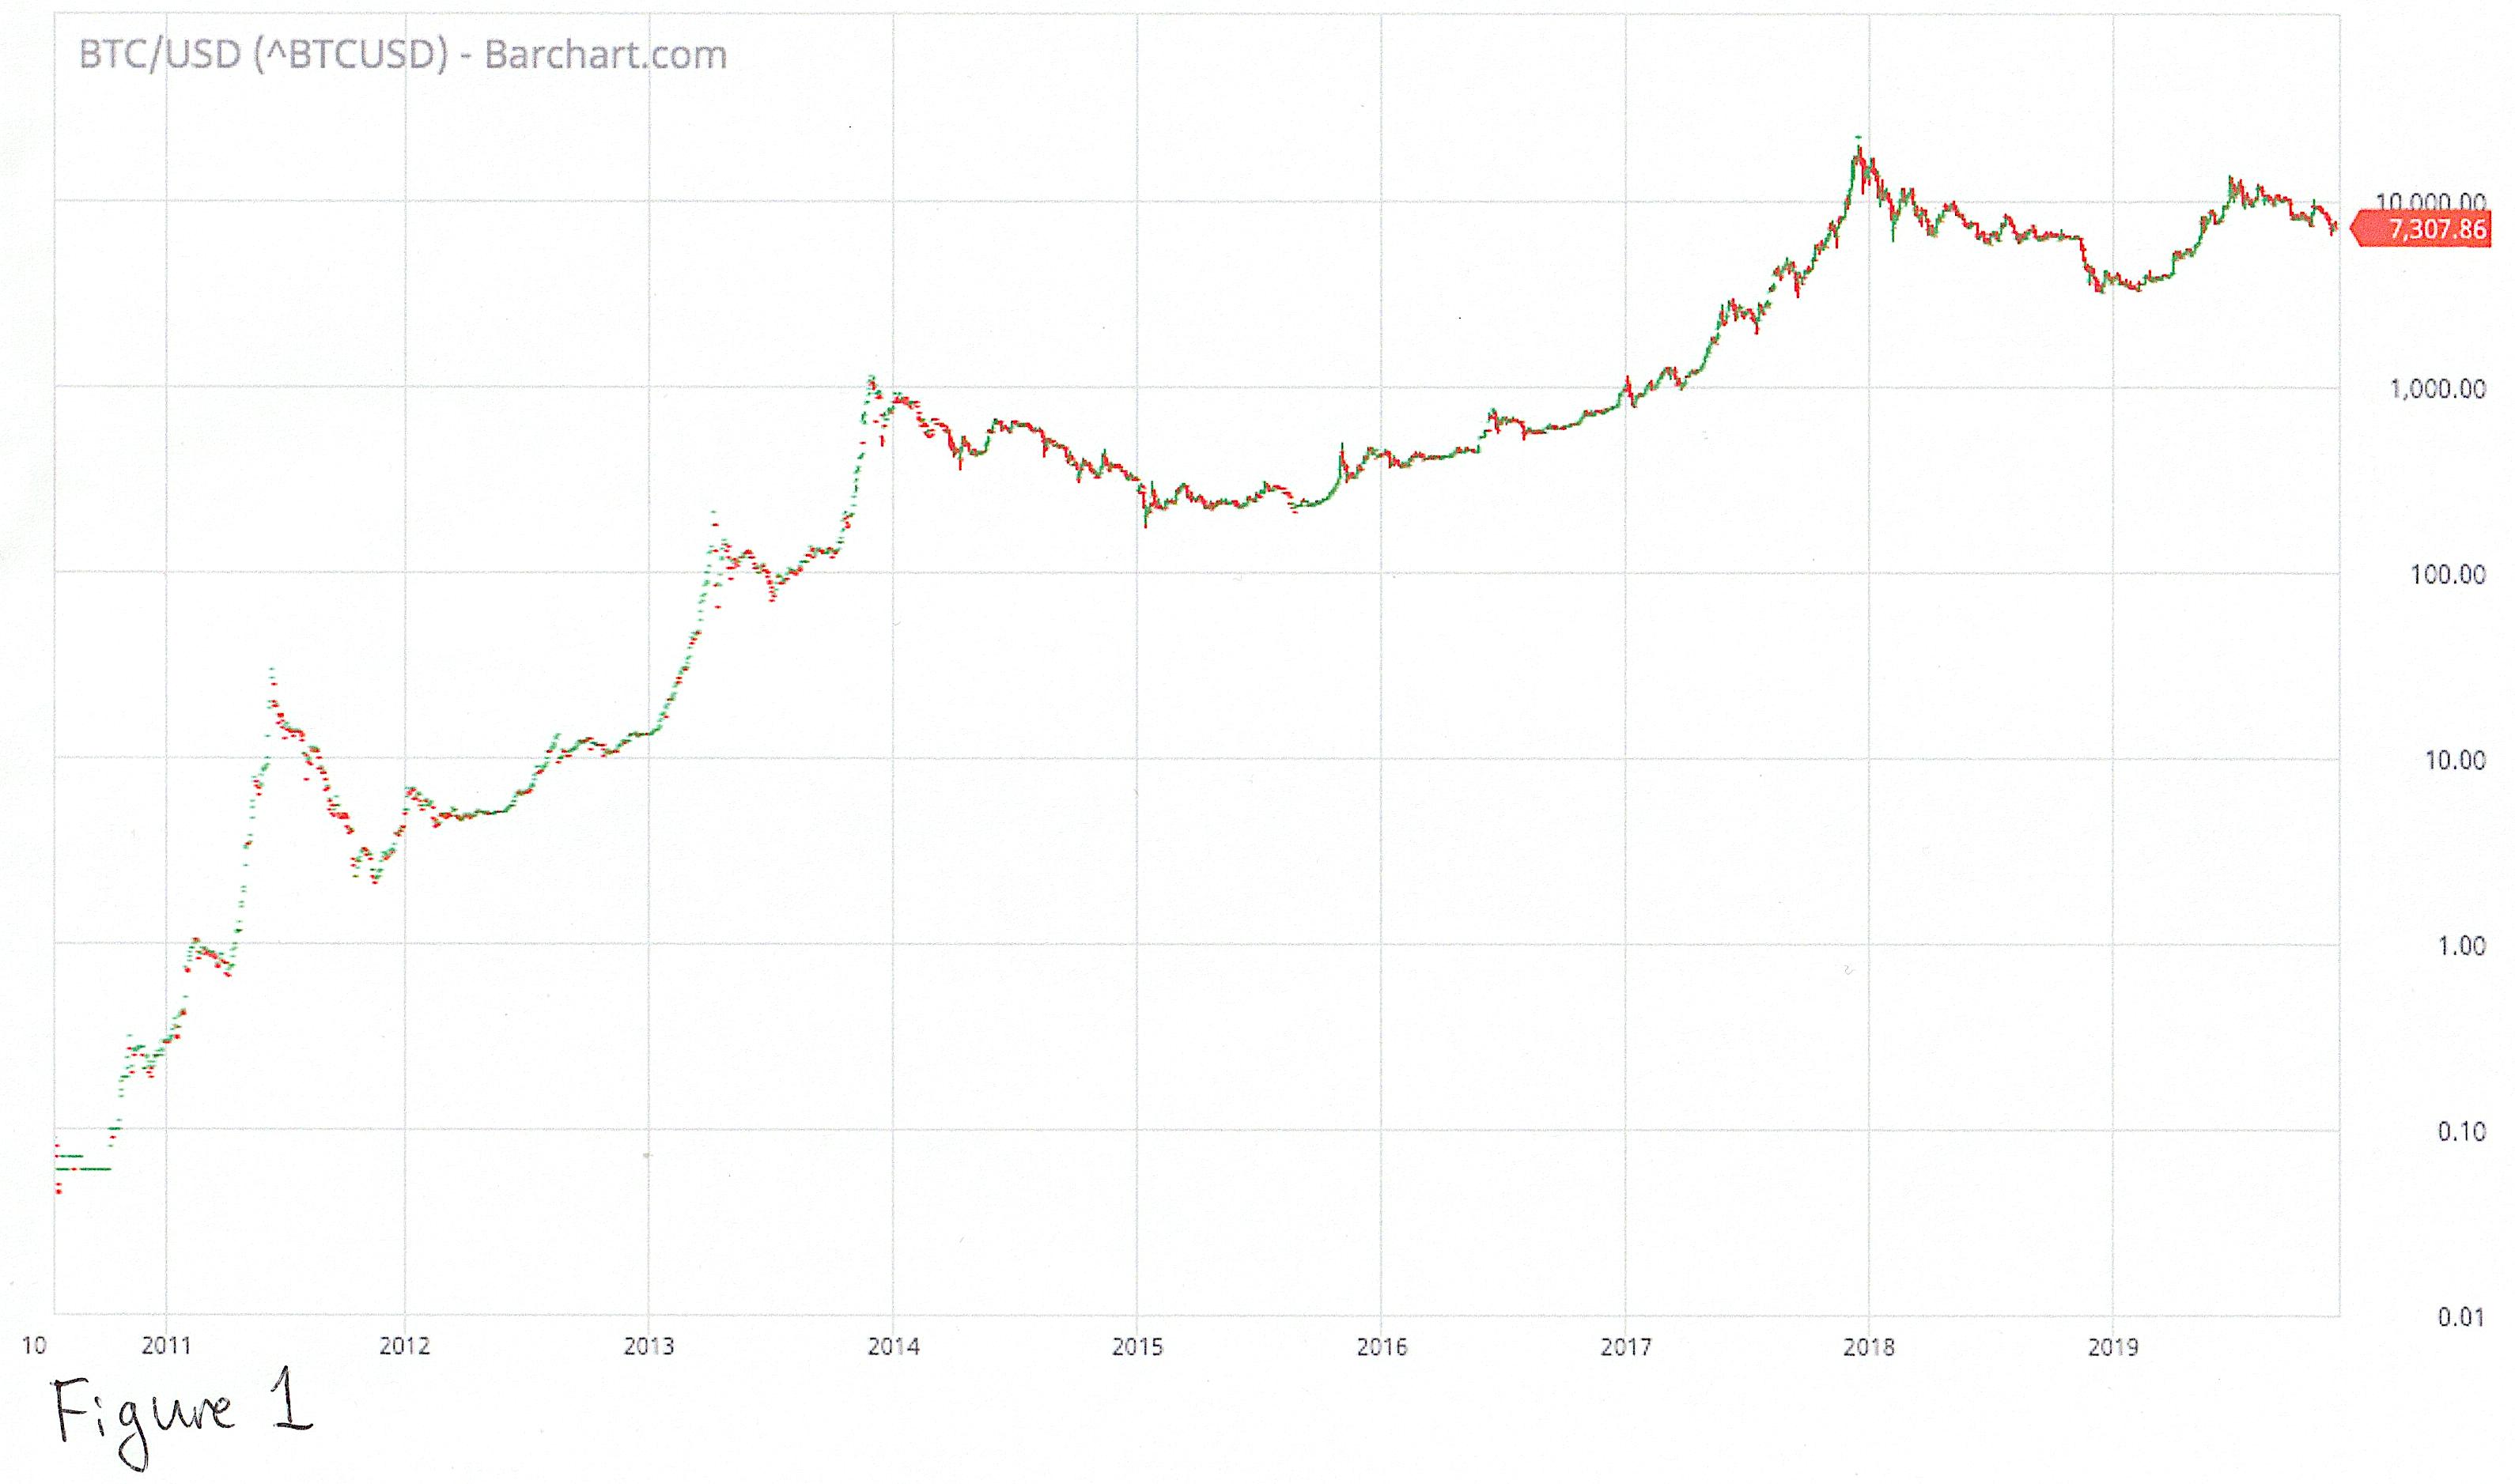 visos bitkoino prekybos verts)